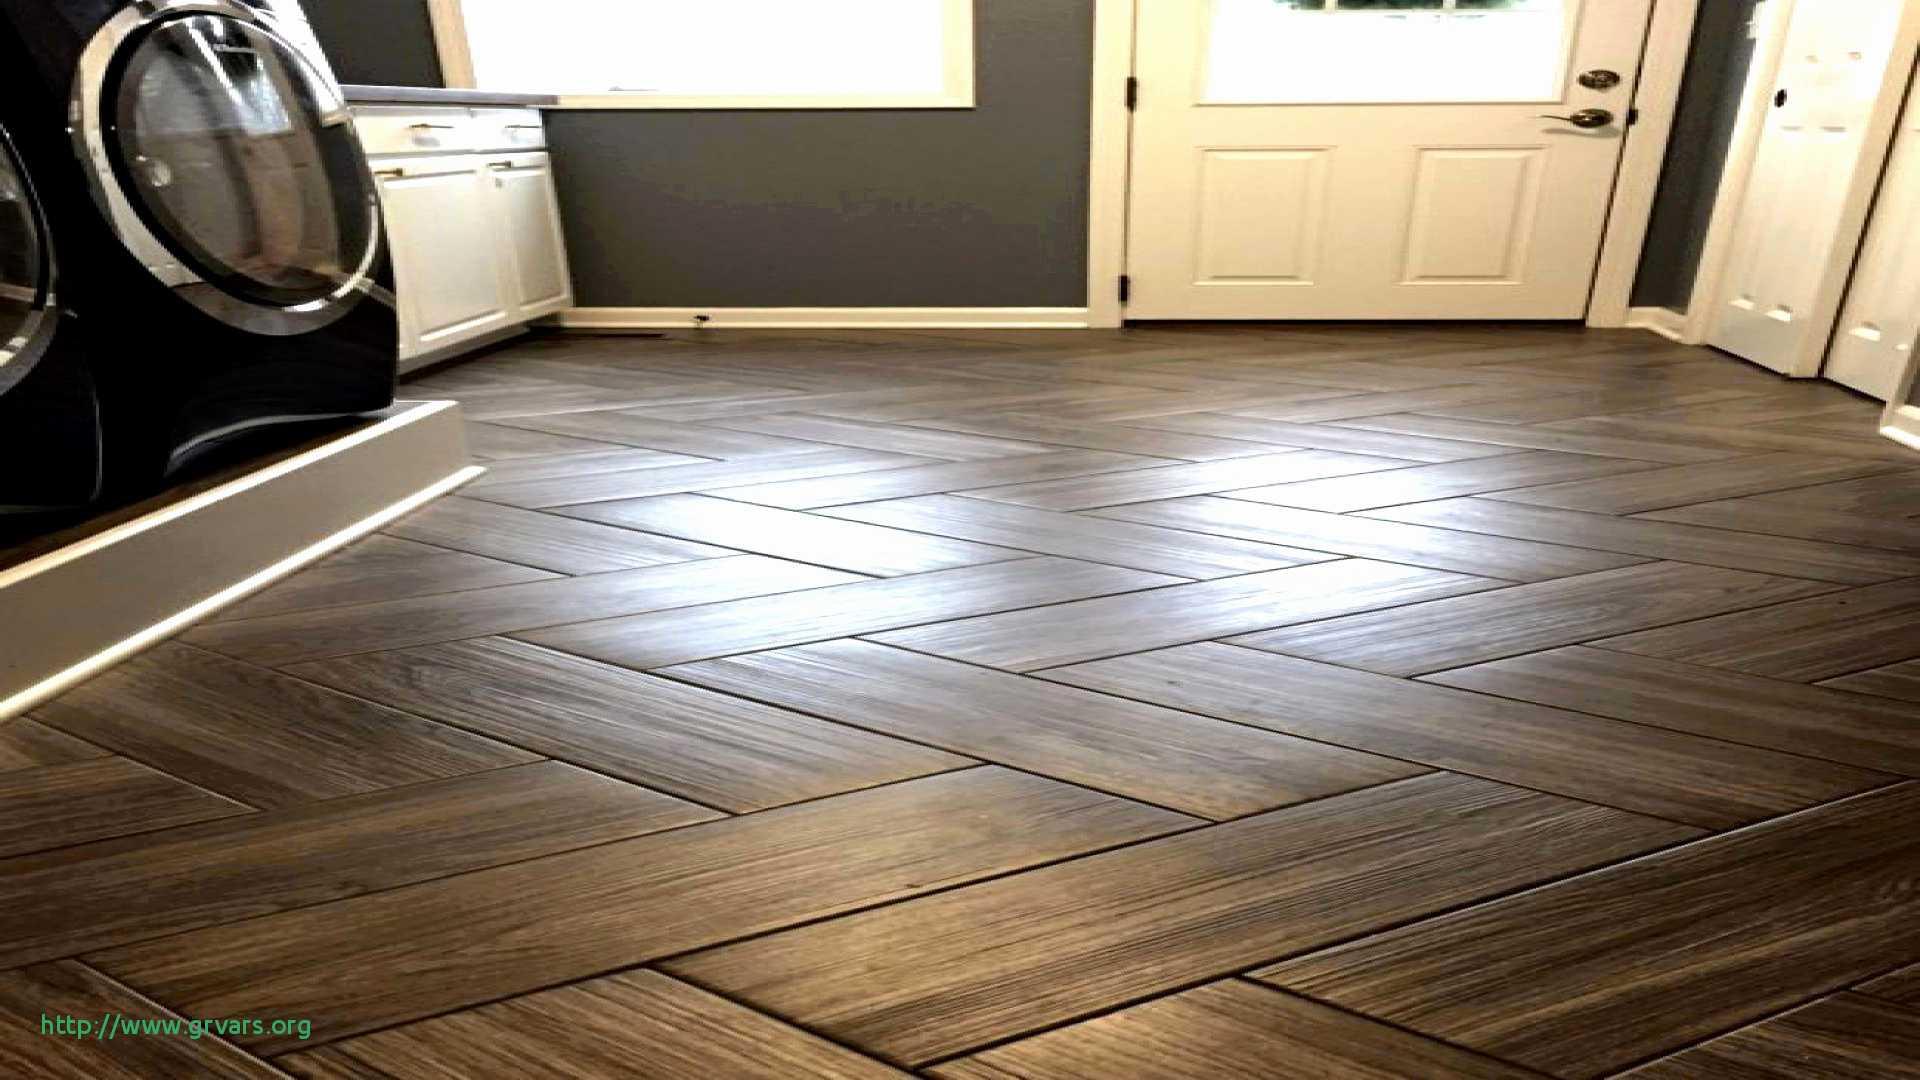 vinyl hardwood flooring vs laminate of 17 charmant can you lay laminate flooring over linoleum ideas blog for kitchen floor tiles home depot elegant s media cache ak0 pinimg 736x 43 0d 97 best